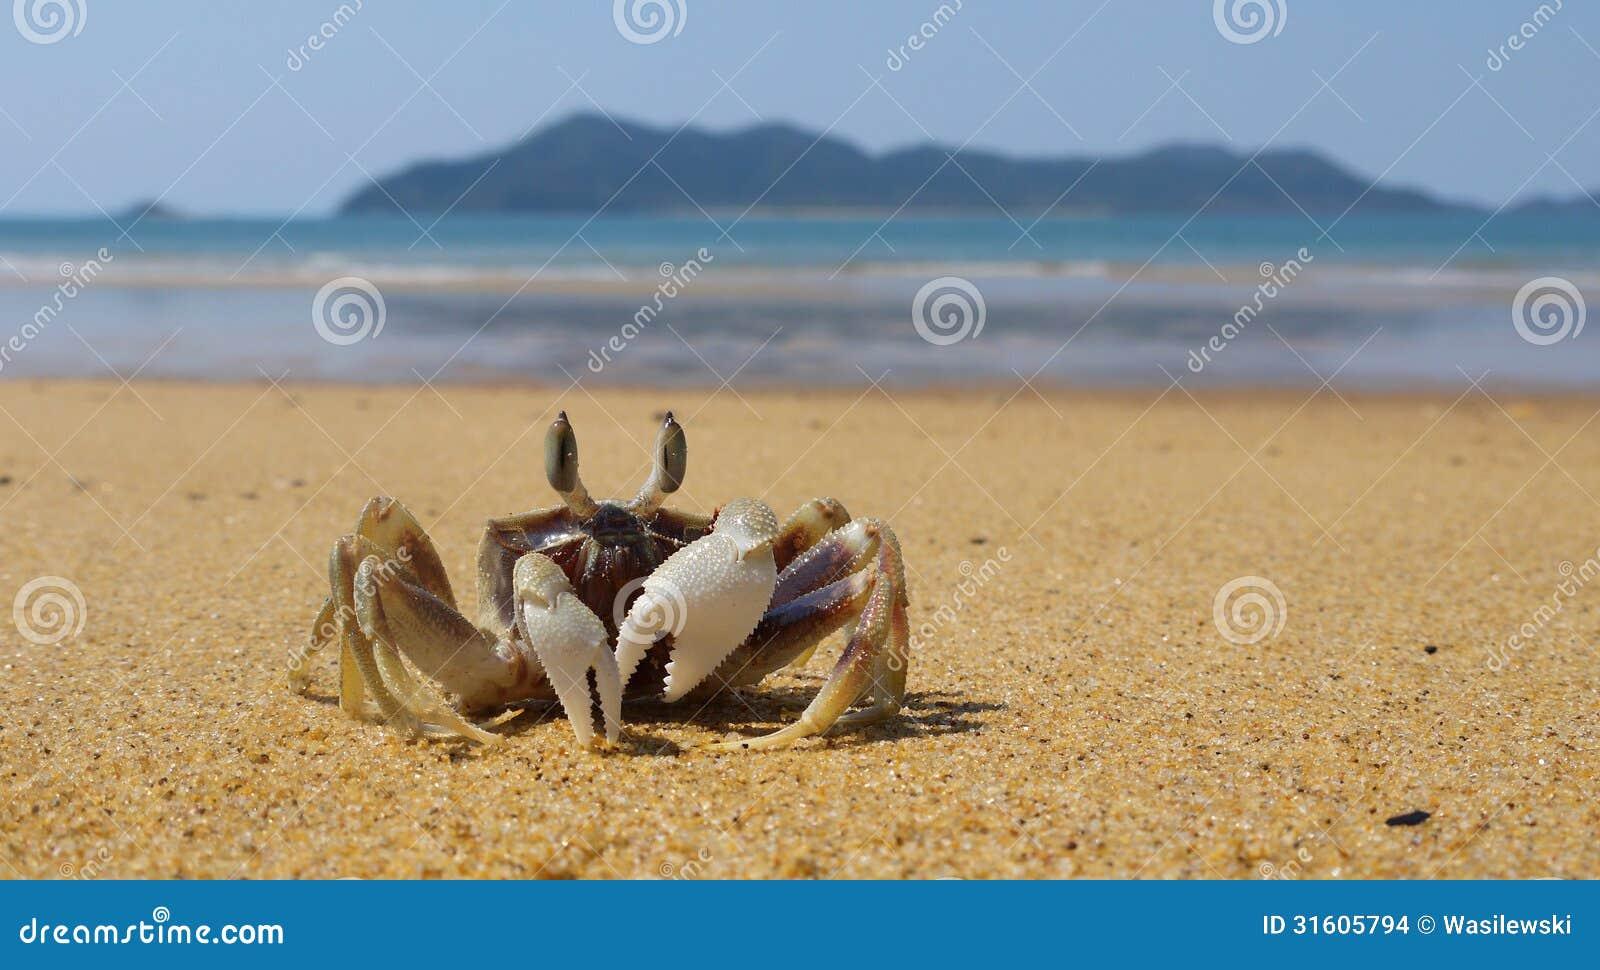 Dunk Island Animals: Fiddler Crab And Dunk Island Stock Photo